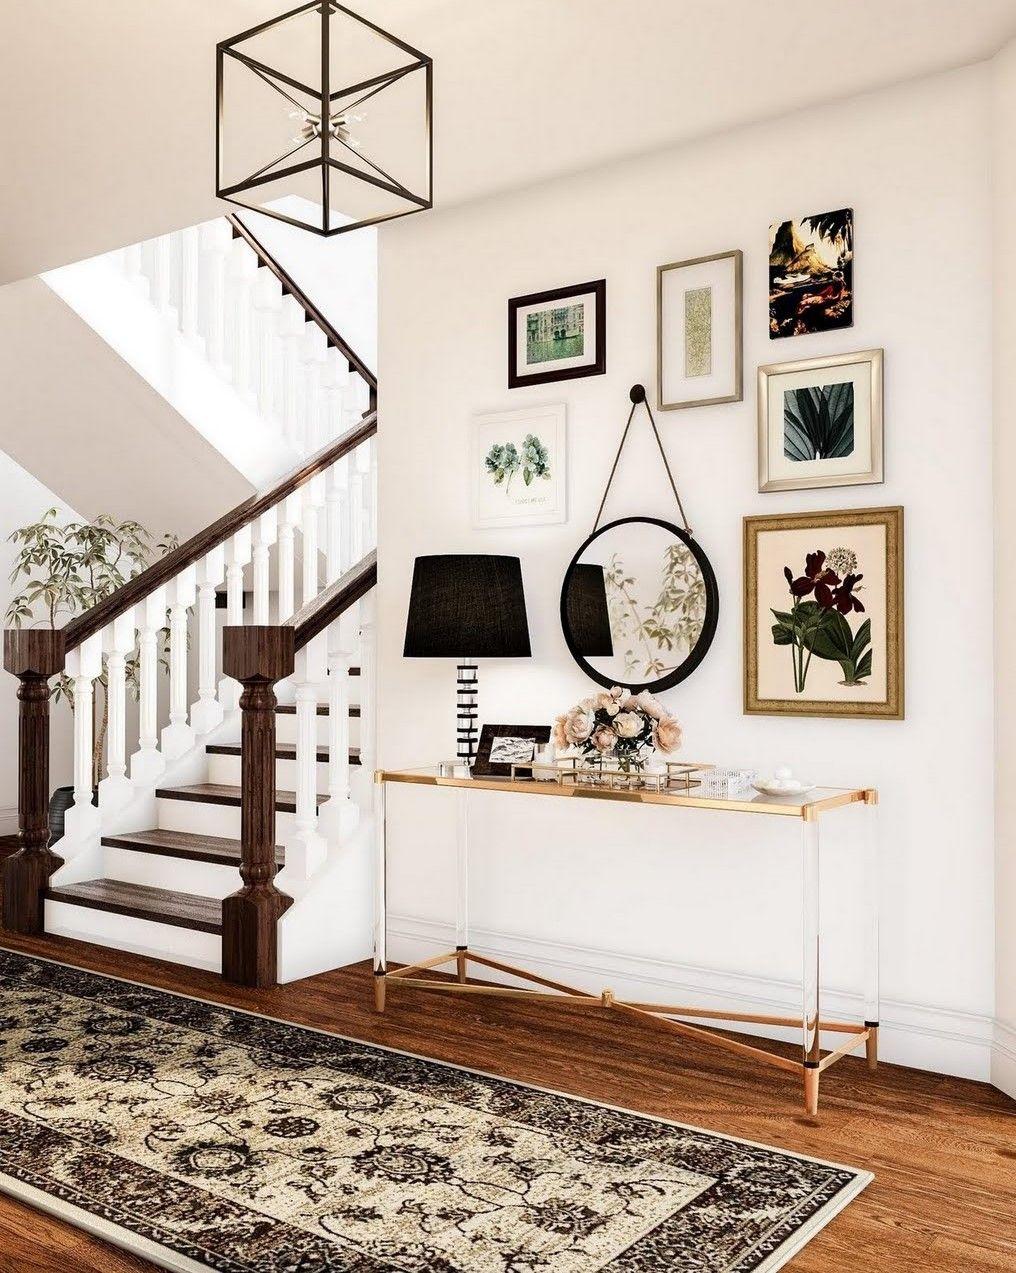 Decorations image by Jessica Freeman | Wall decor living ... on Creative Living Room Wall Decor Ideas  id=29015